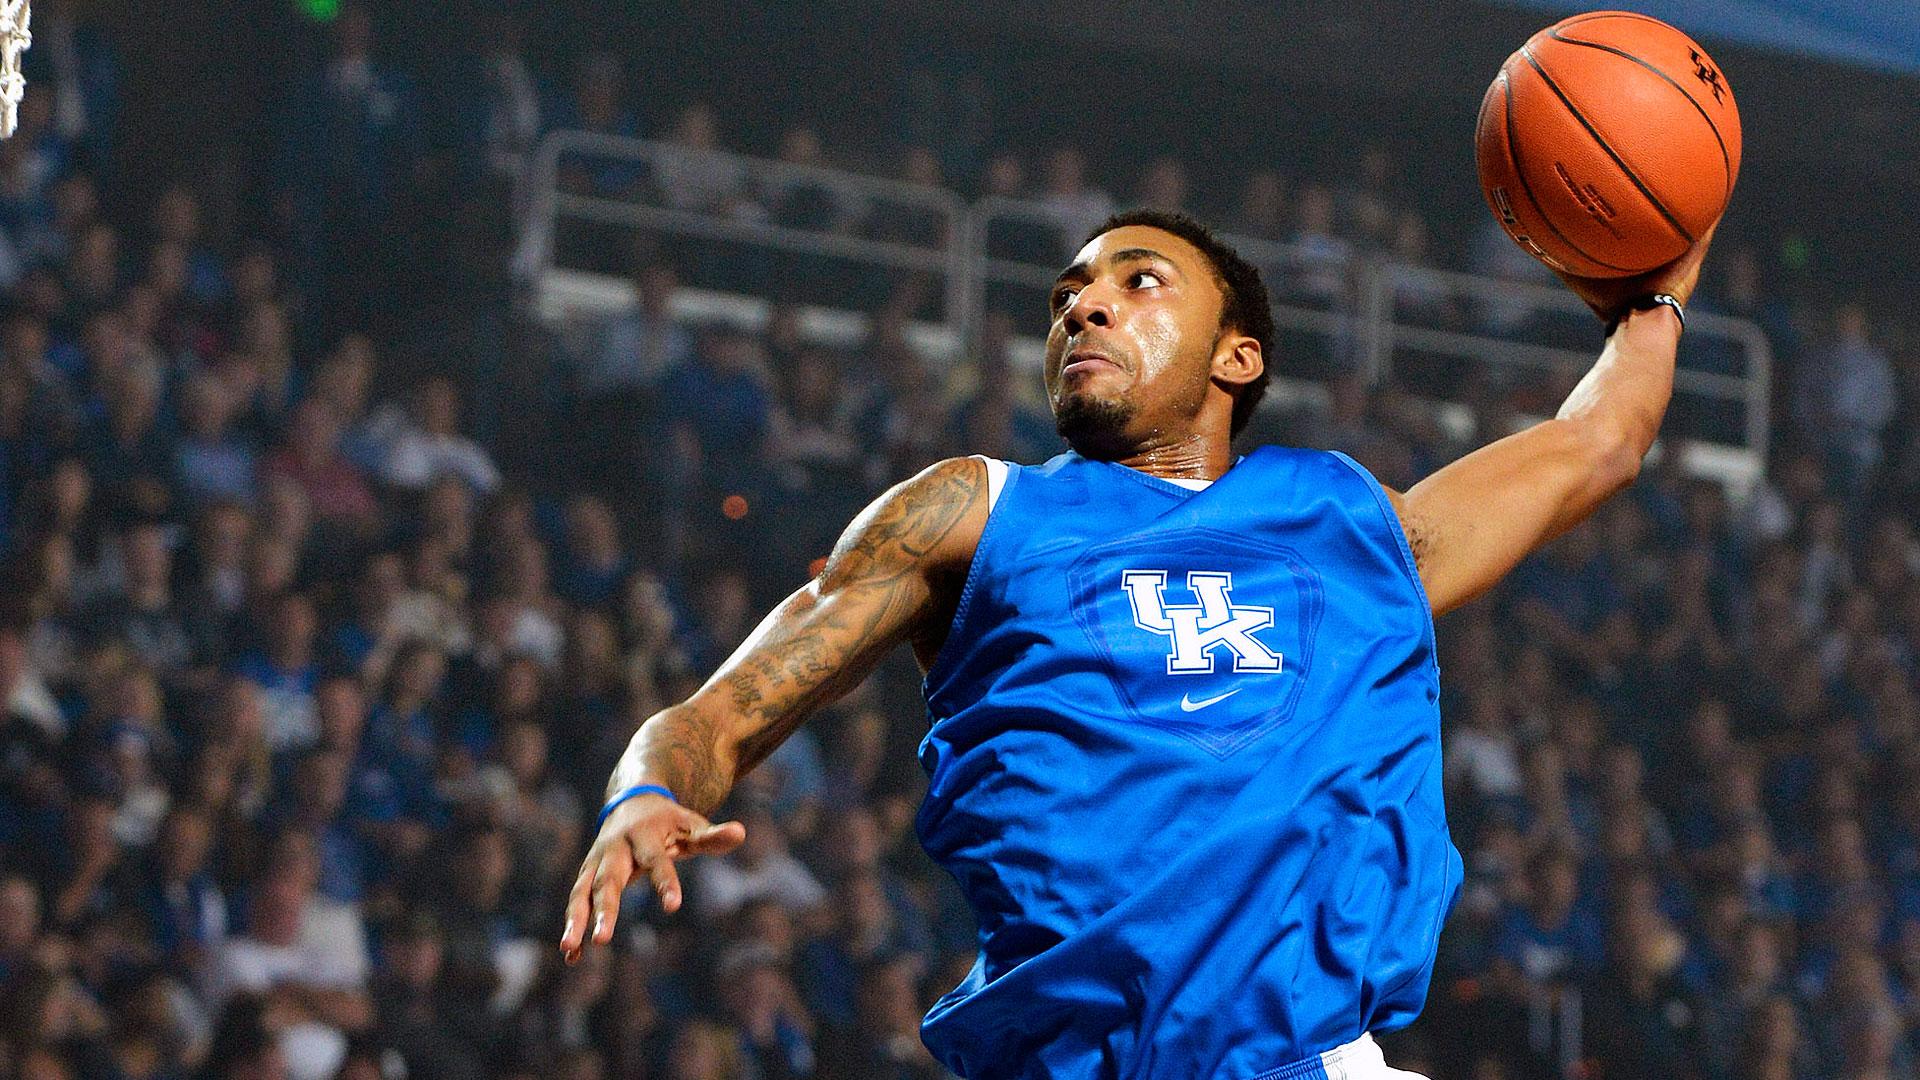 Kentucky Basketball Is An Enigma Well Into The Season: Season Of Change: John Calipari Kentucky Wildcats To Run